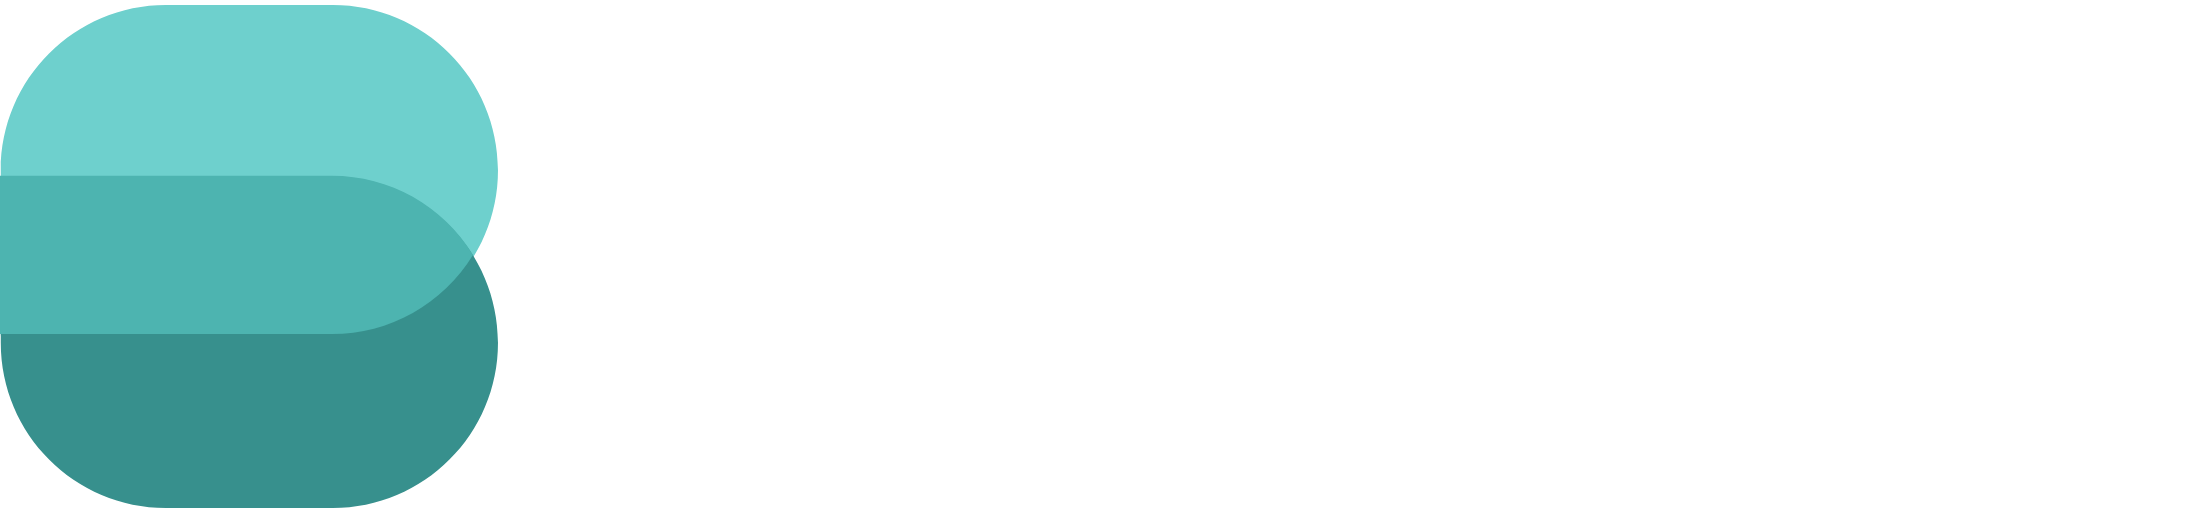 Brandcurry Logo